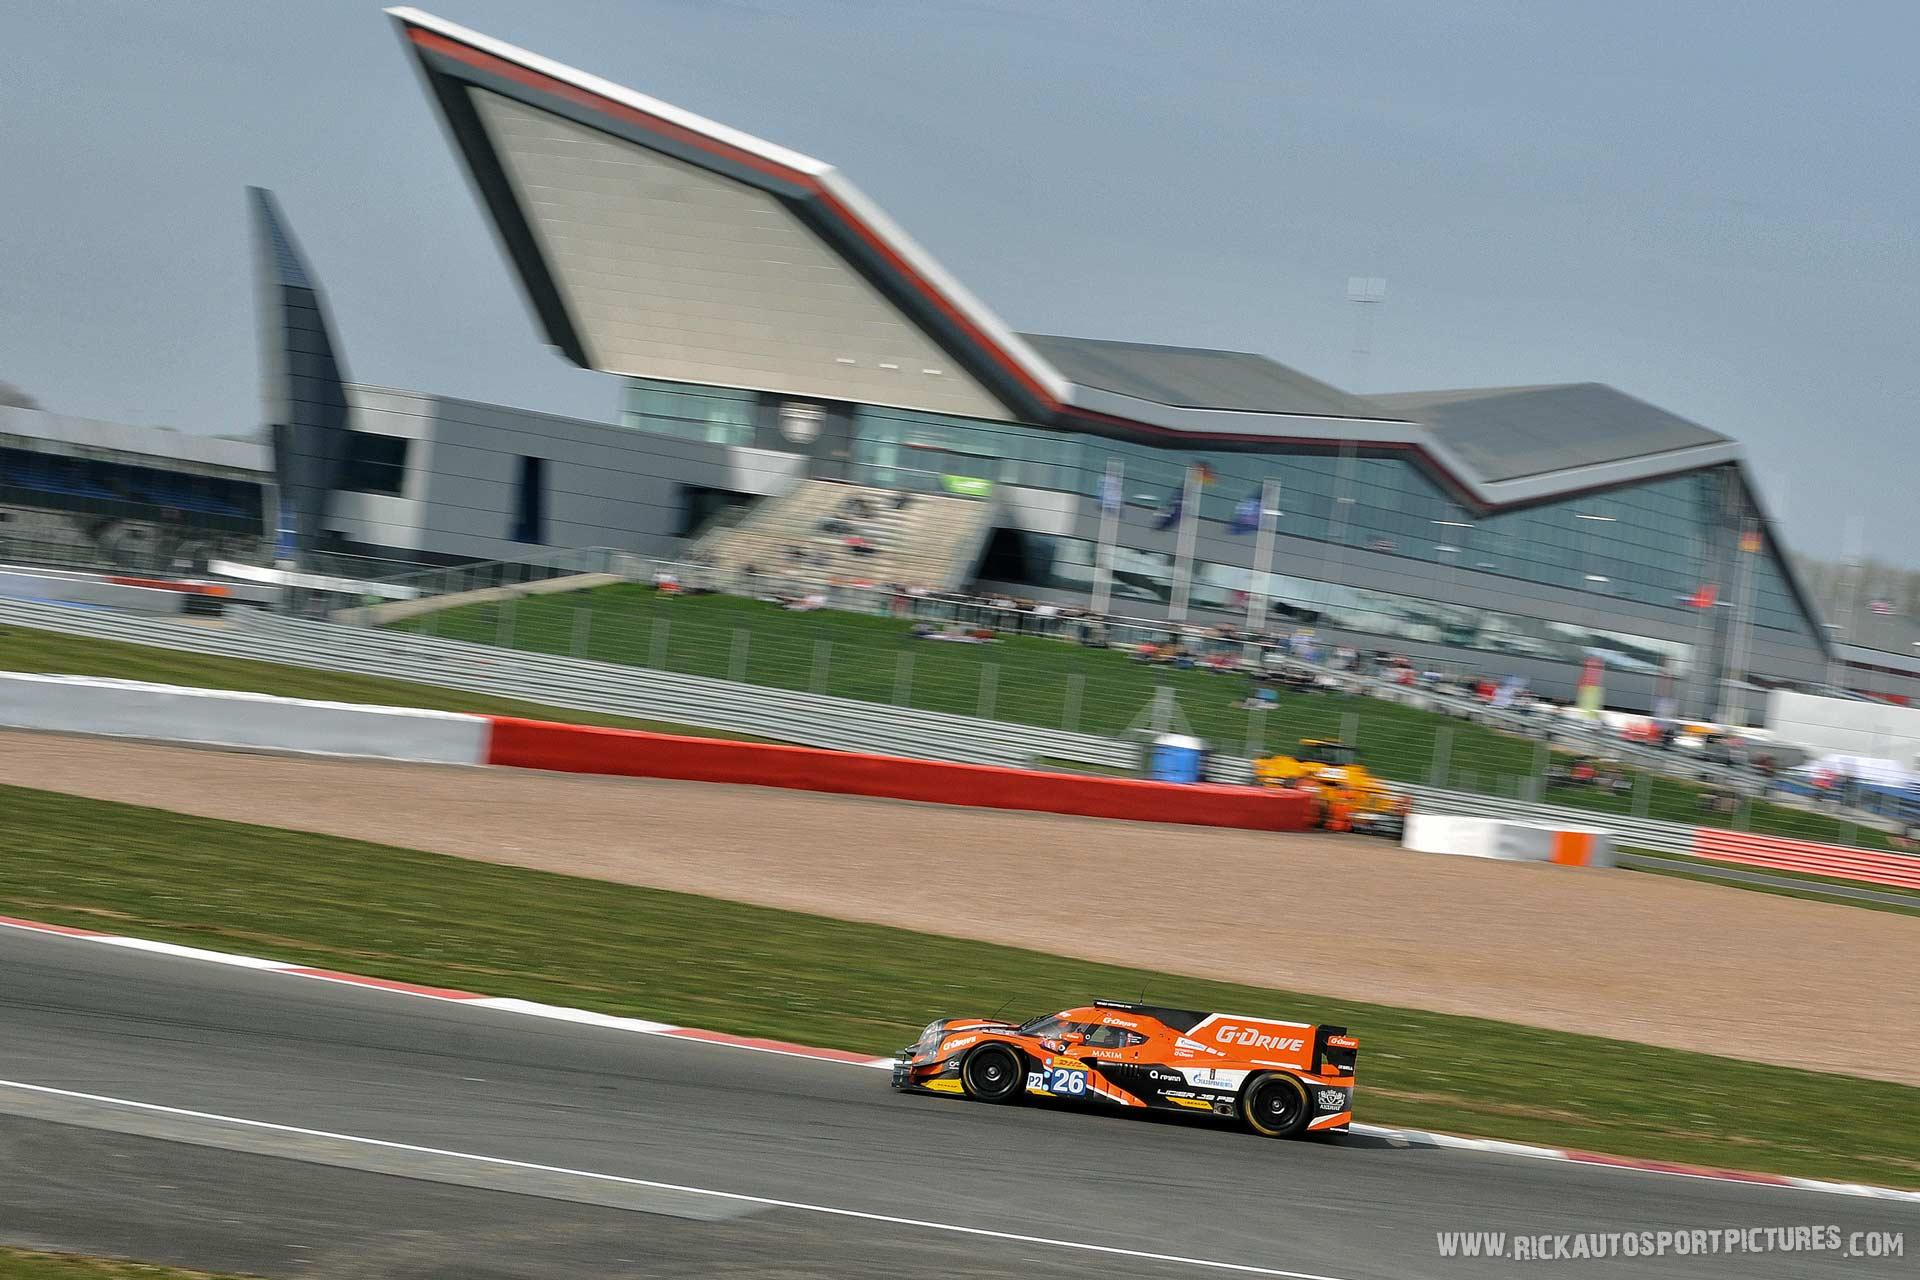 Roman Rusinov G-Drive WEC Silverstone 2015